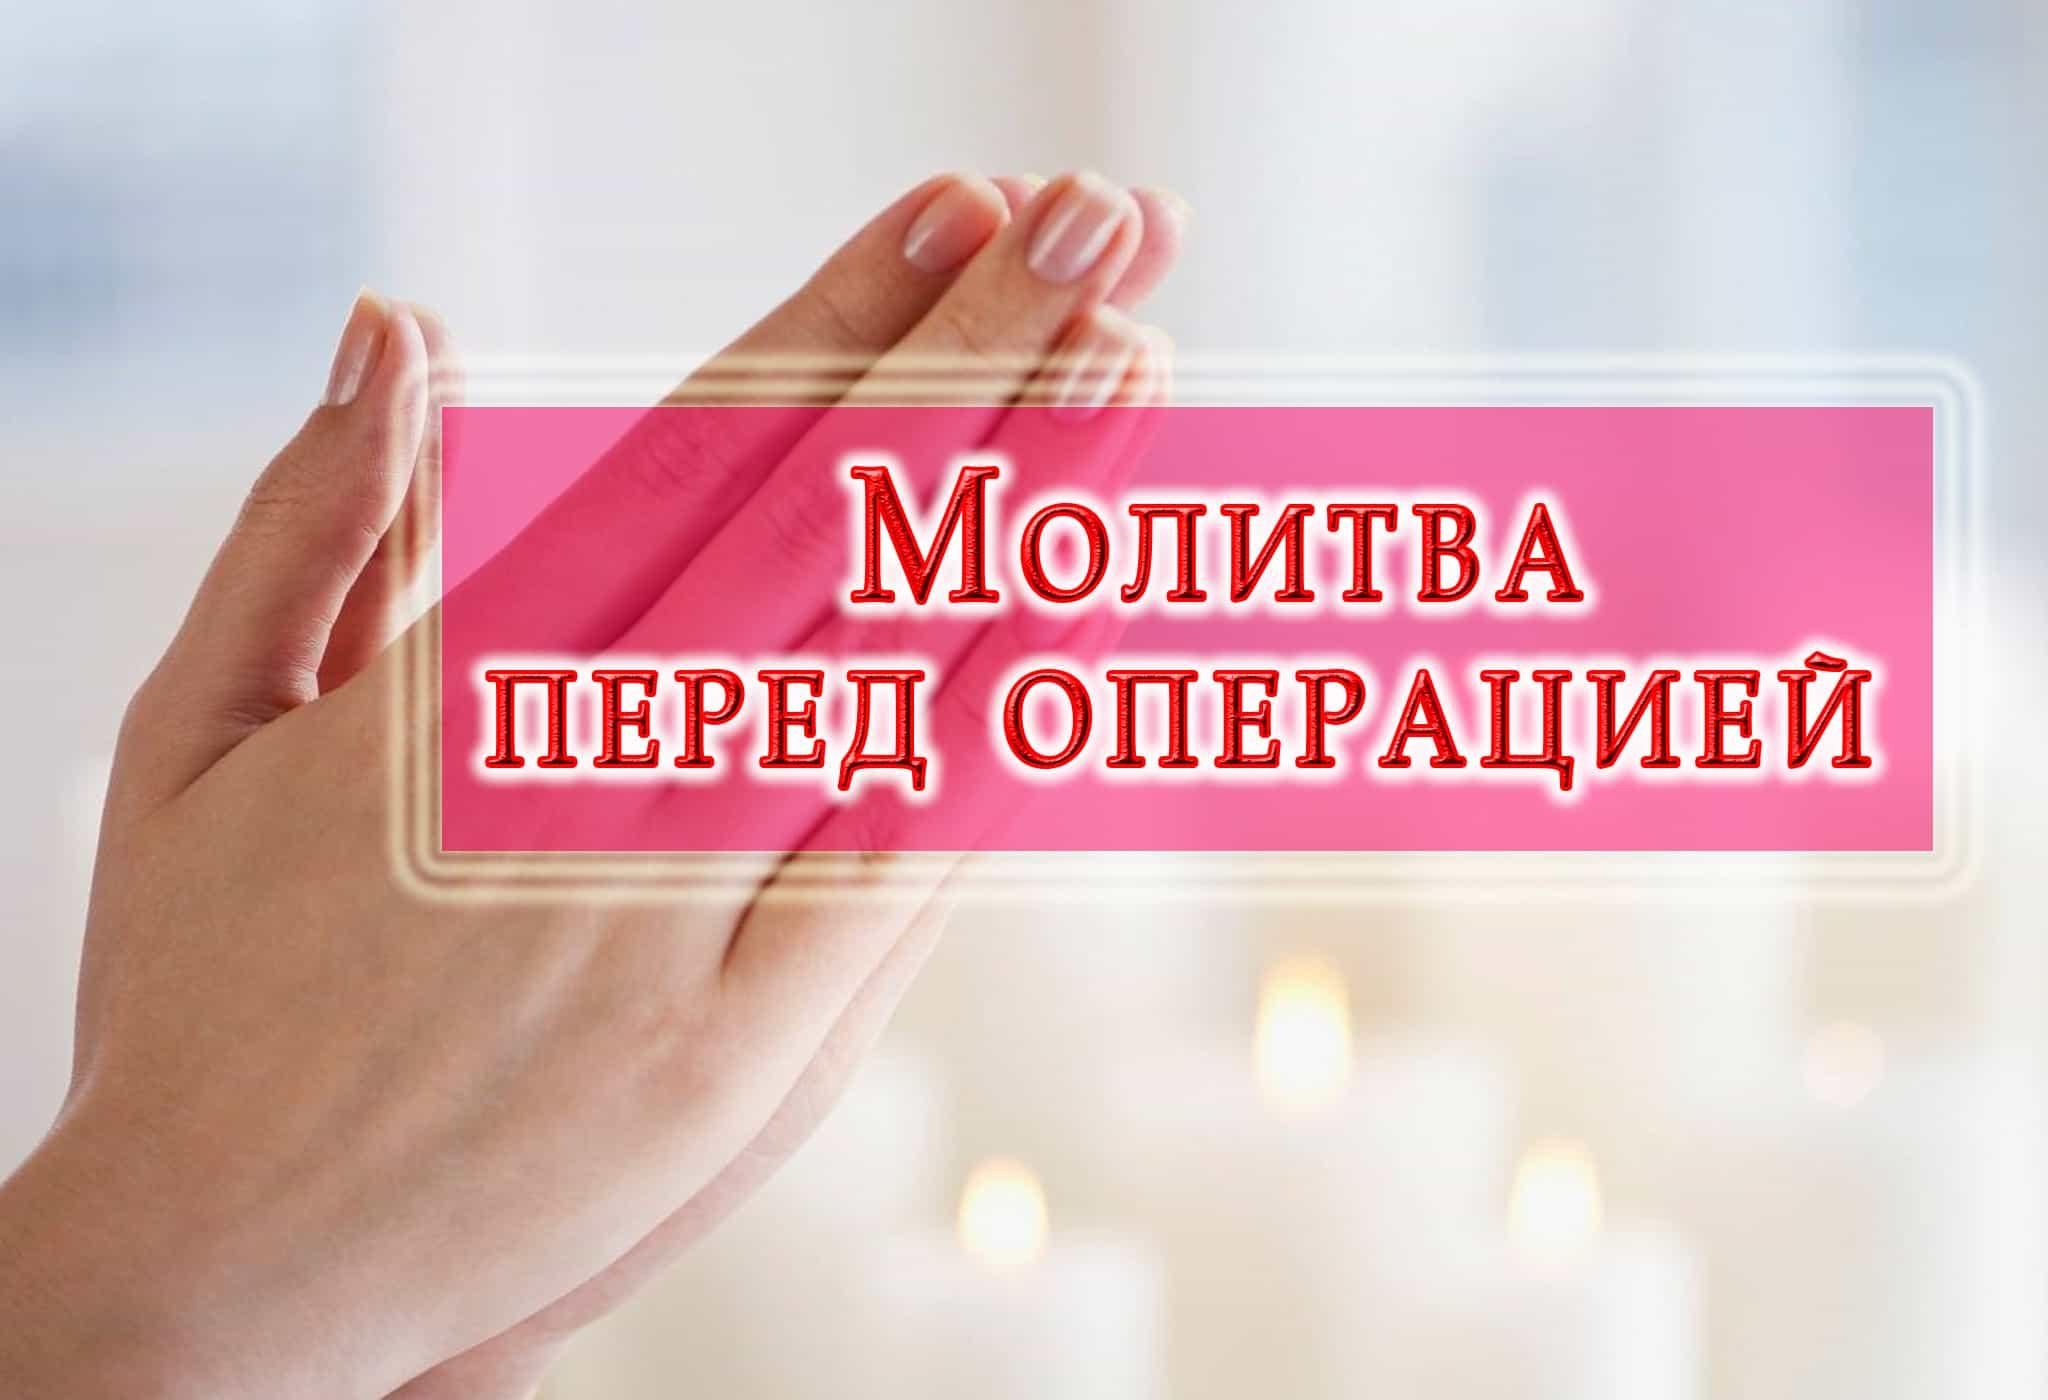 Молитва перед хирургическим вмешательством из сербского требника